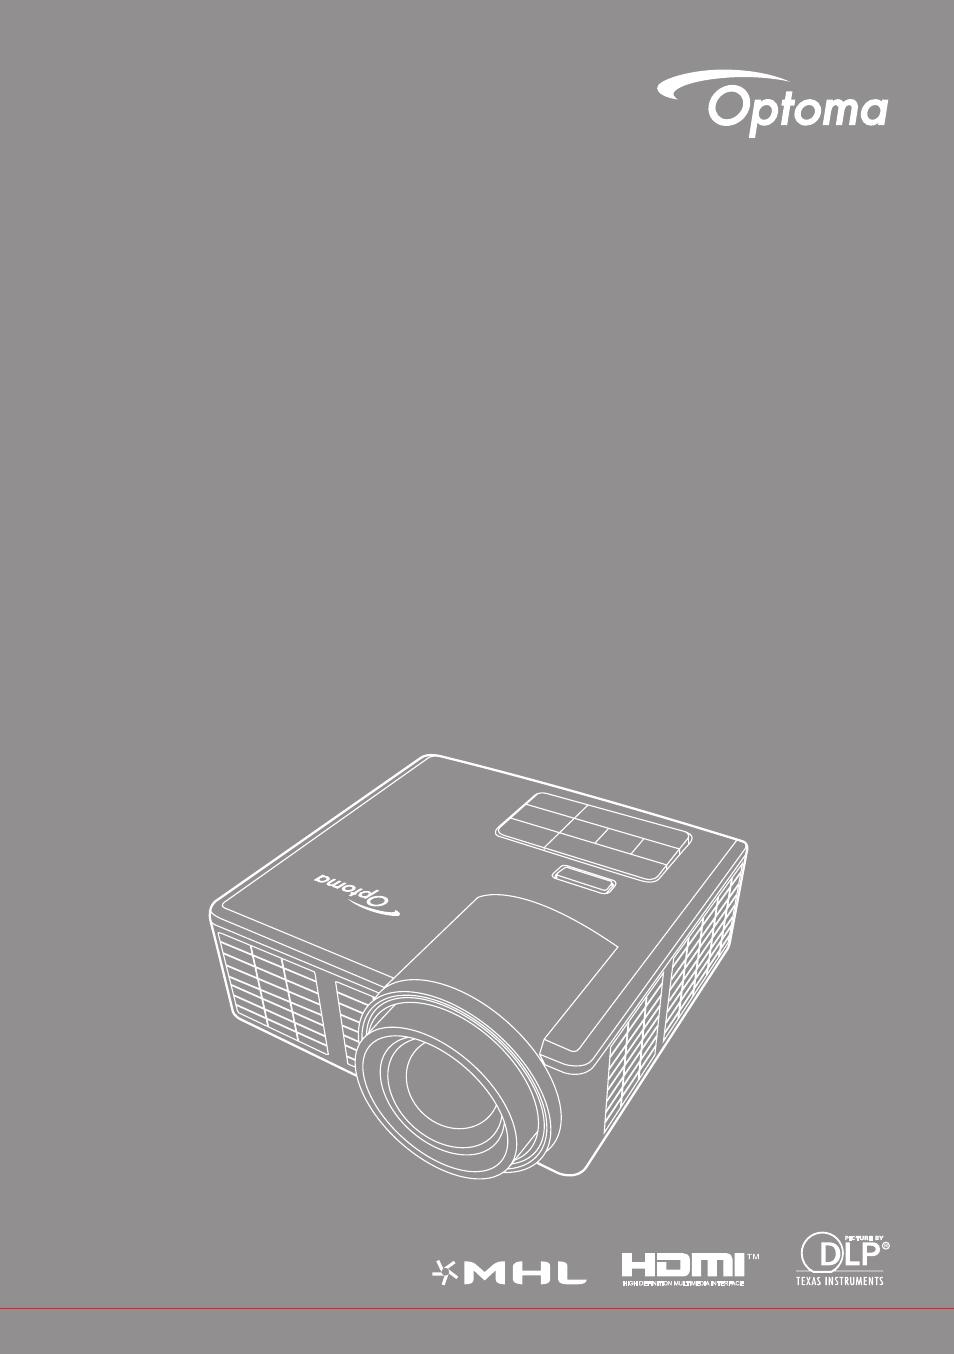 optoma ml750st user manual 57 pages rh manualsdir com user manual optoma projector user manual led projector